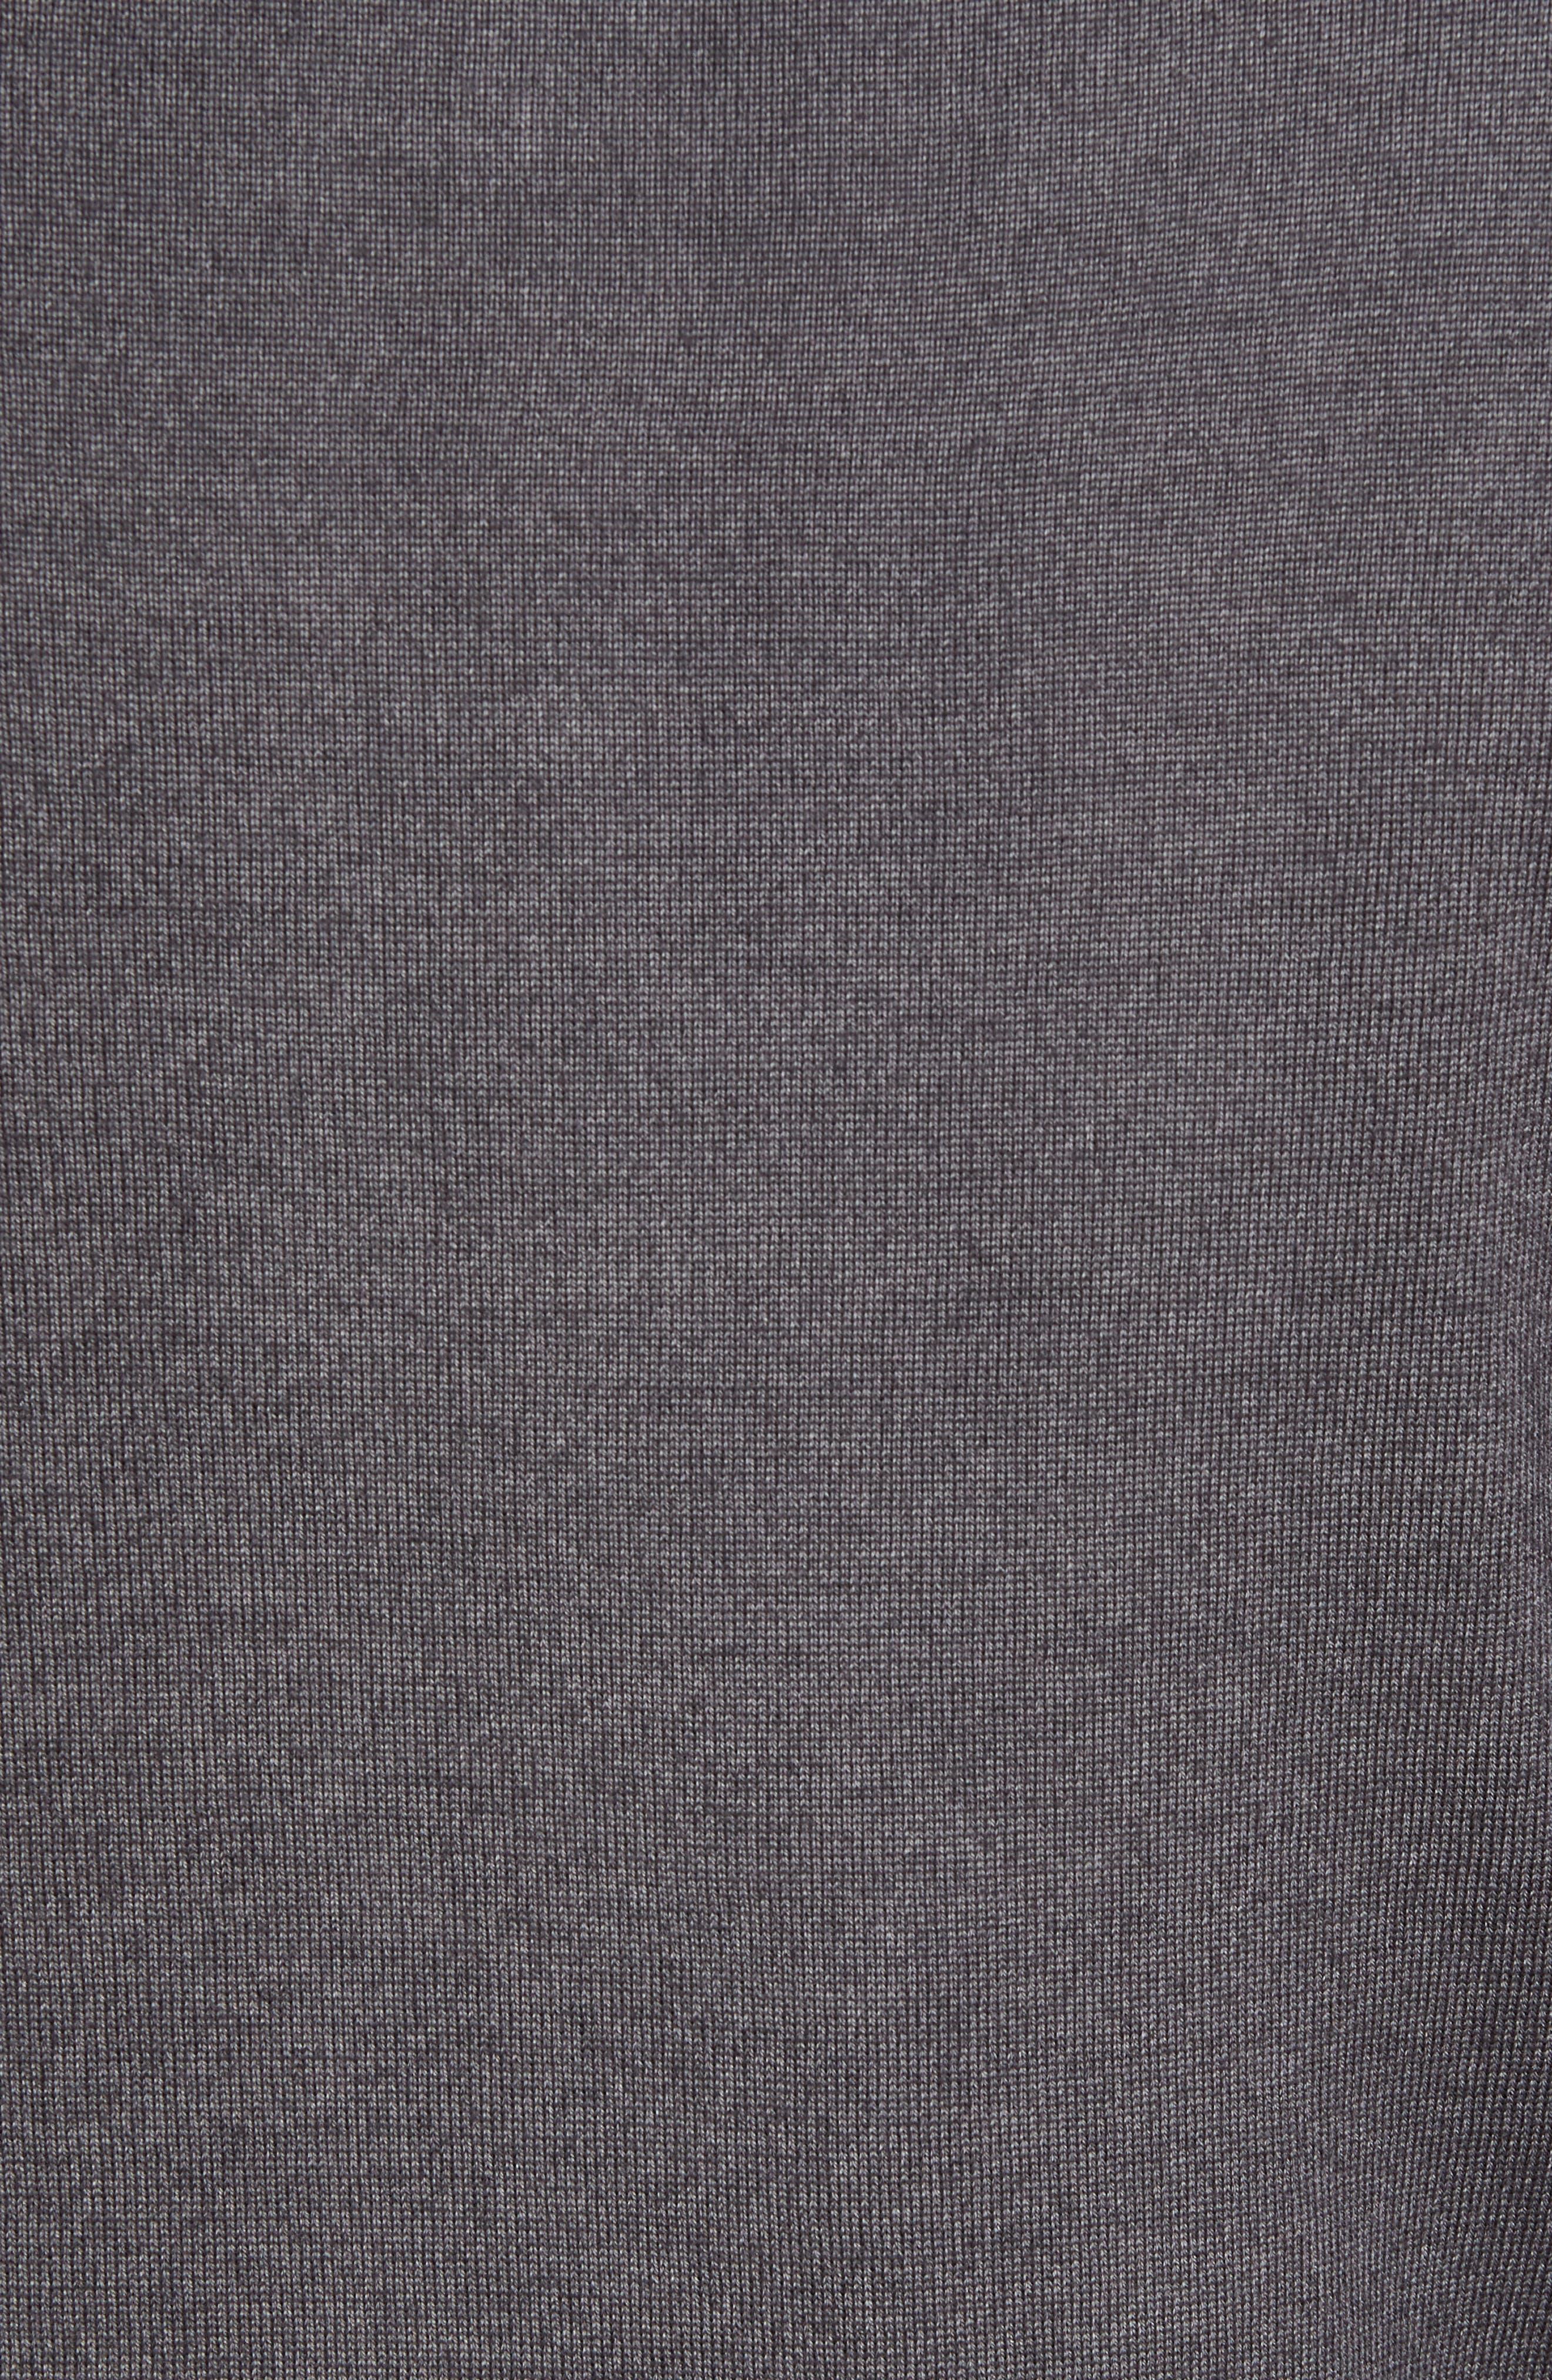 Ice Merino Wool Quarter Zip Pullover,                             Alternate thumbnail 5, color,                             010